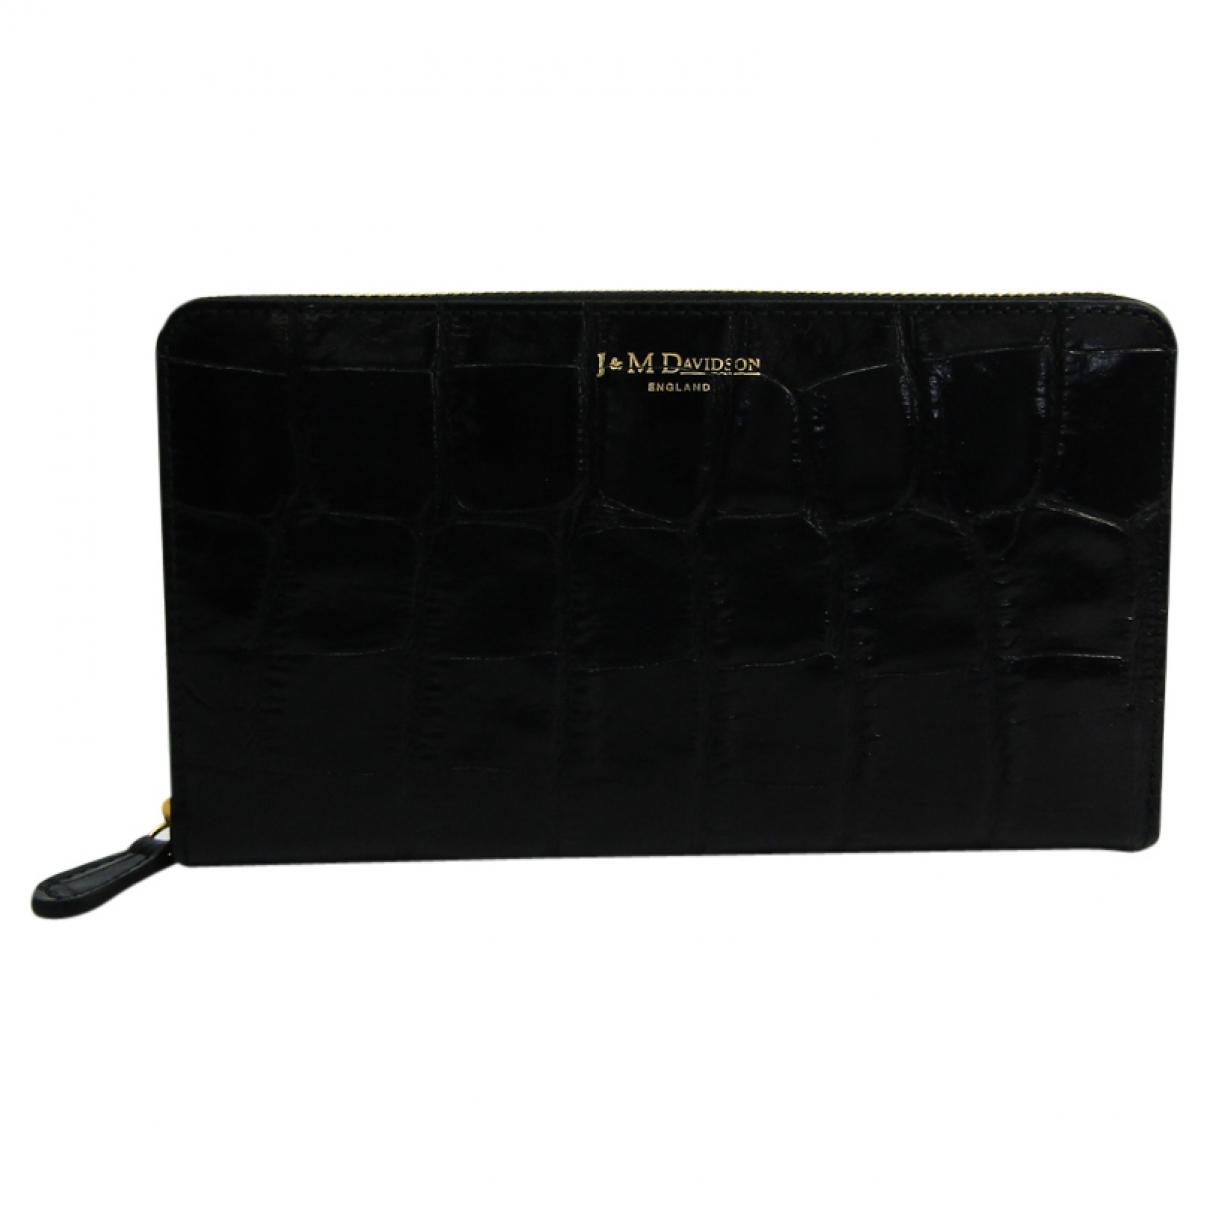 J & M Davidson \N Black Leather wallet for Women \N